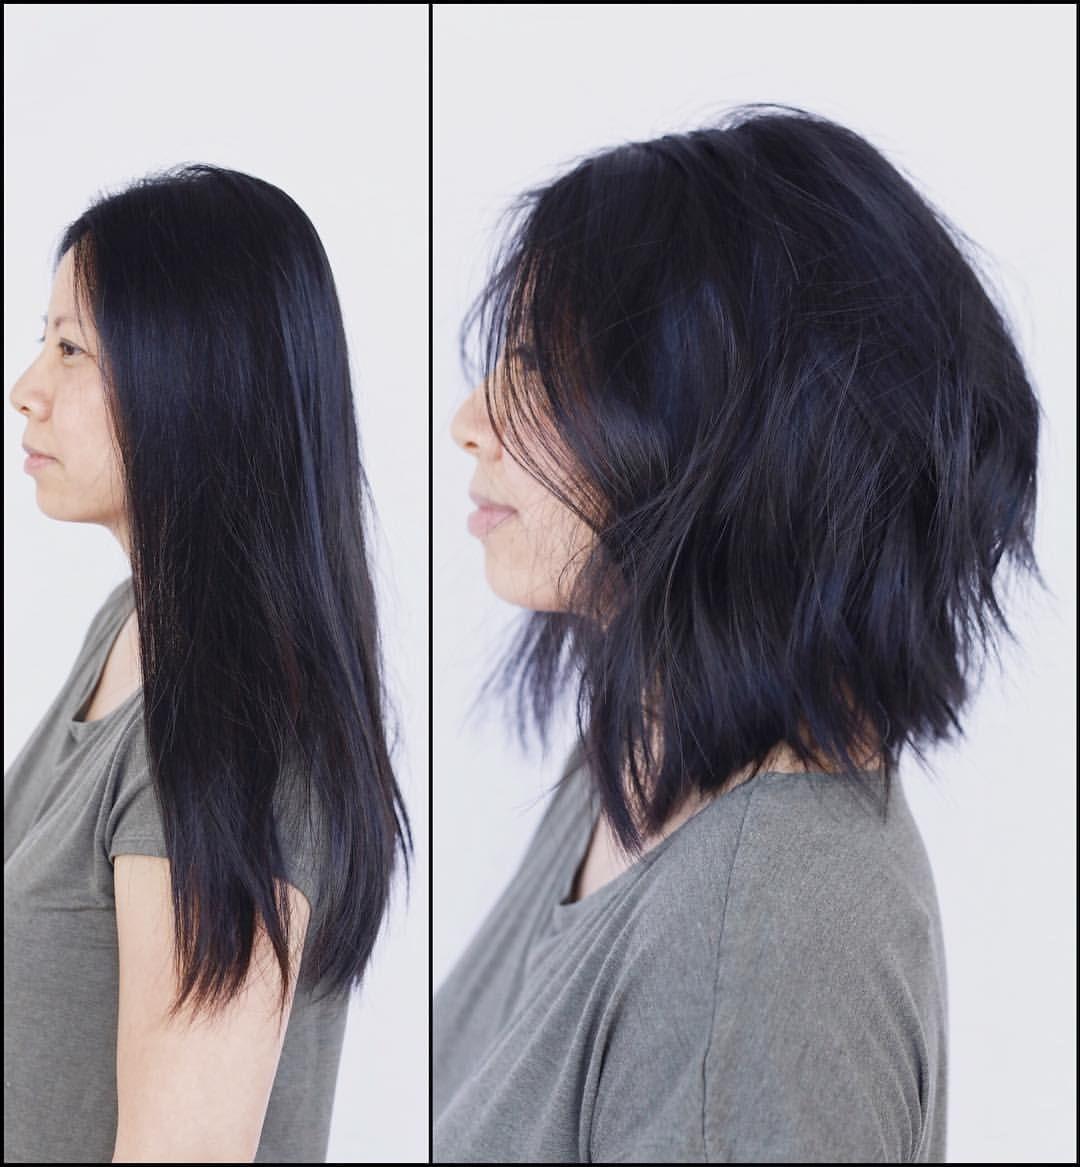 Snip Snip Beforeandafter Haircut Anhcotran Anh Co Tran Hair Styles Long Hair Styles